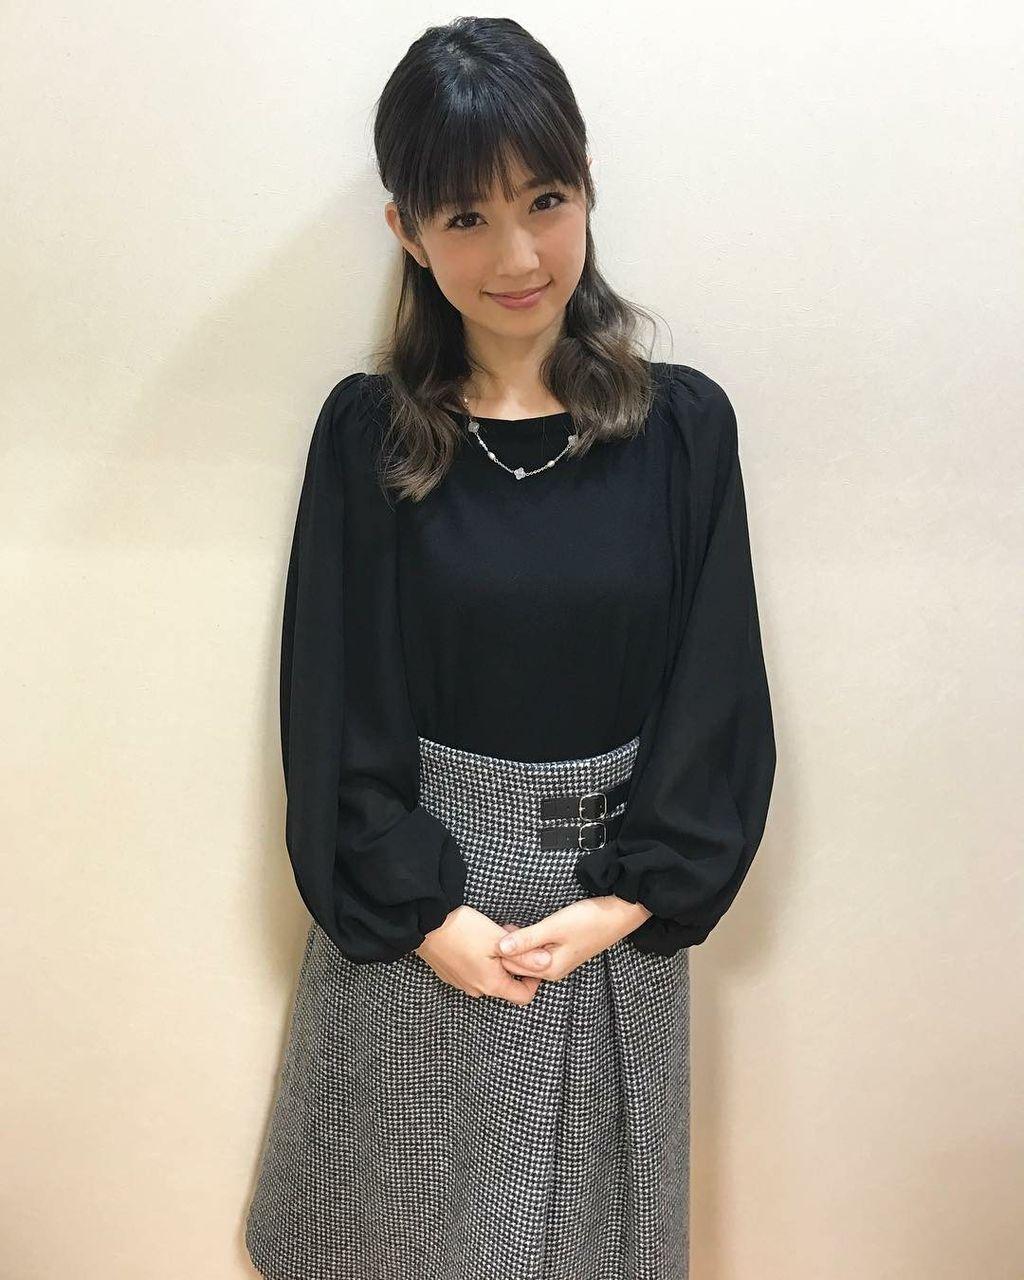 ogura_yuuko130.jpg